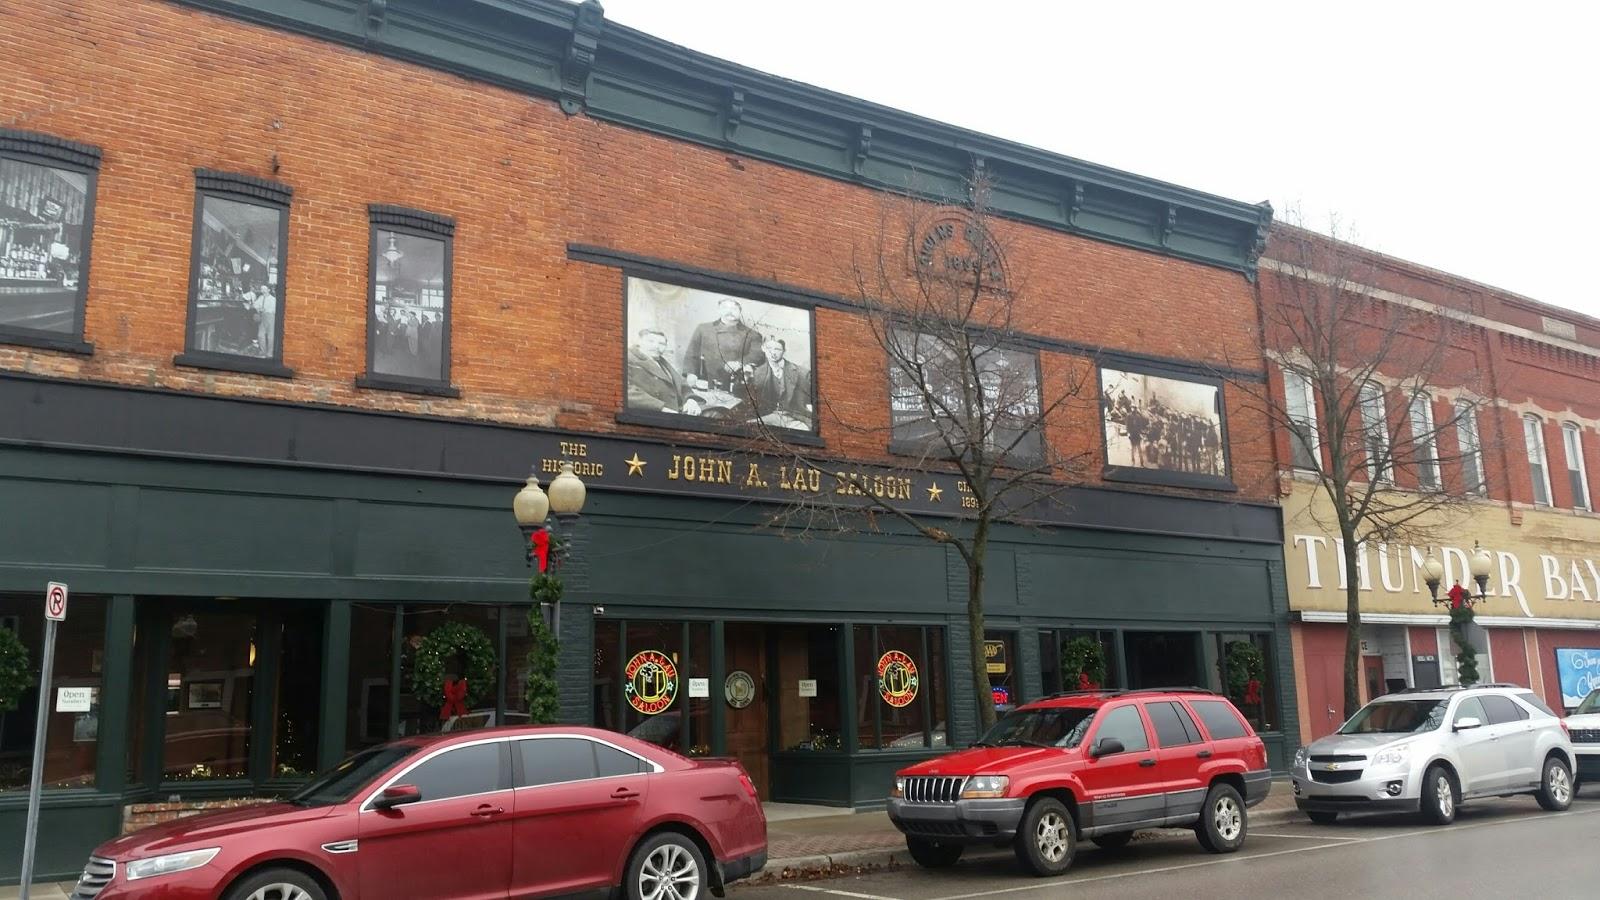 John A. Lau Saloon in Alpena, Michigan